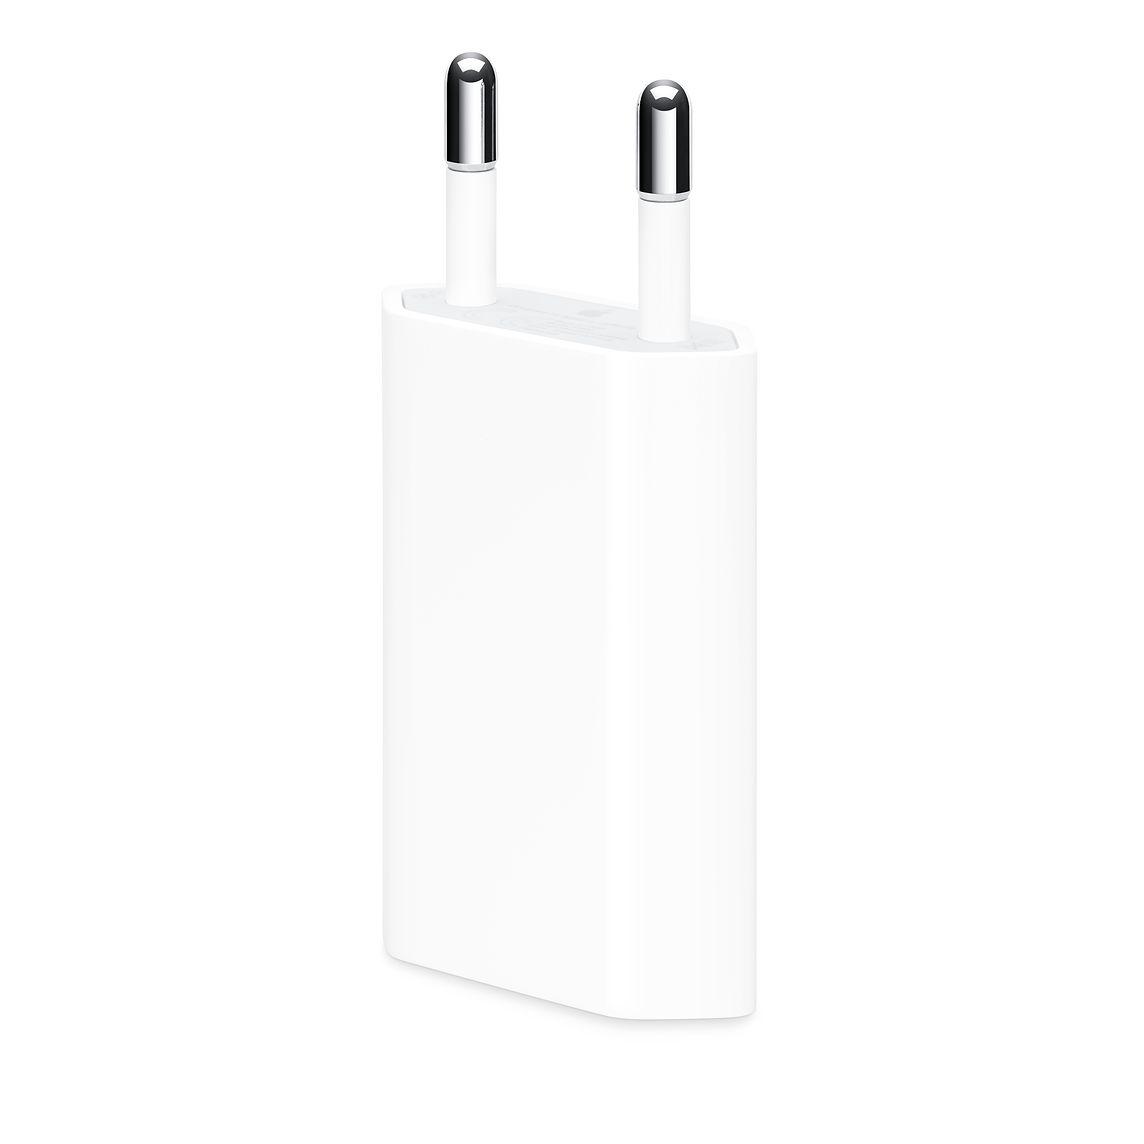 Apple İphone Adaptör Orijinal